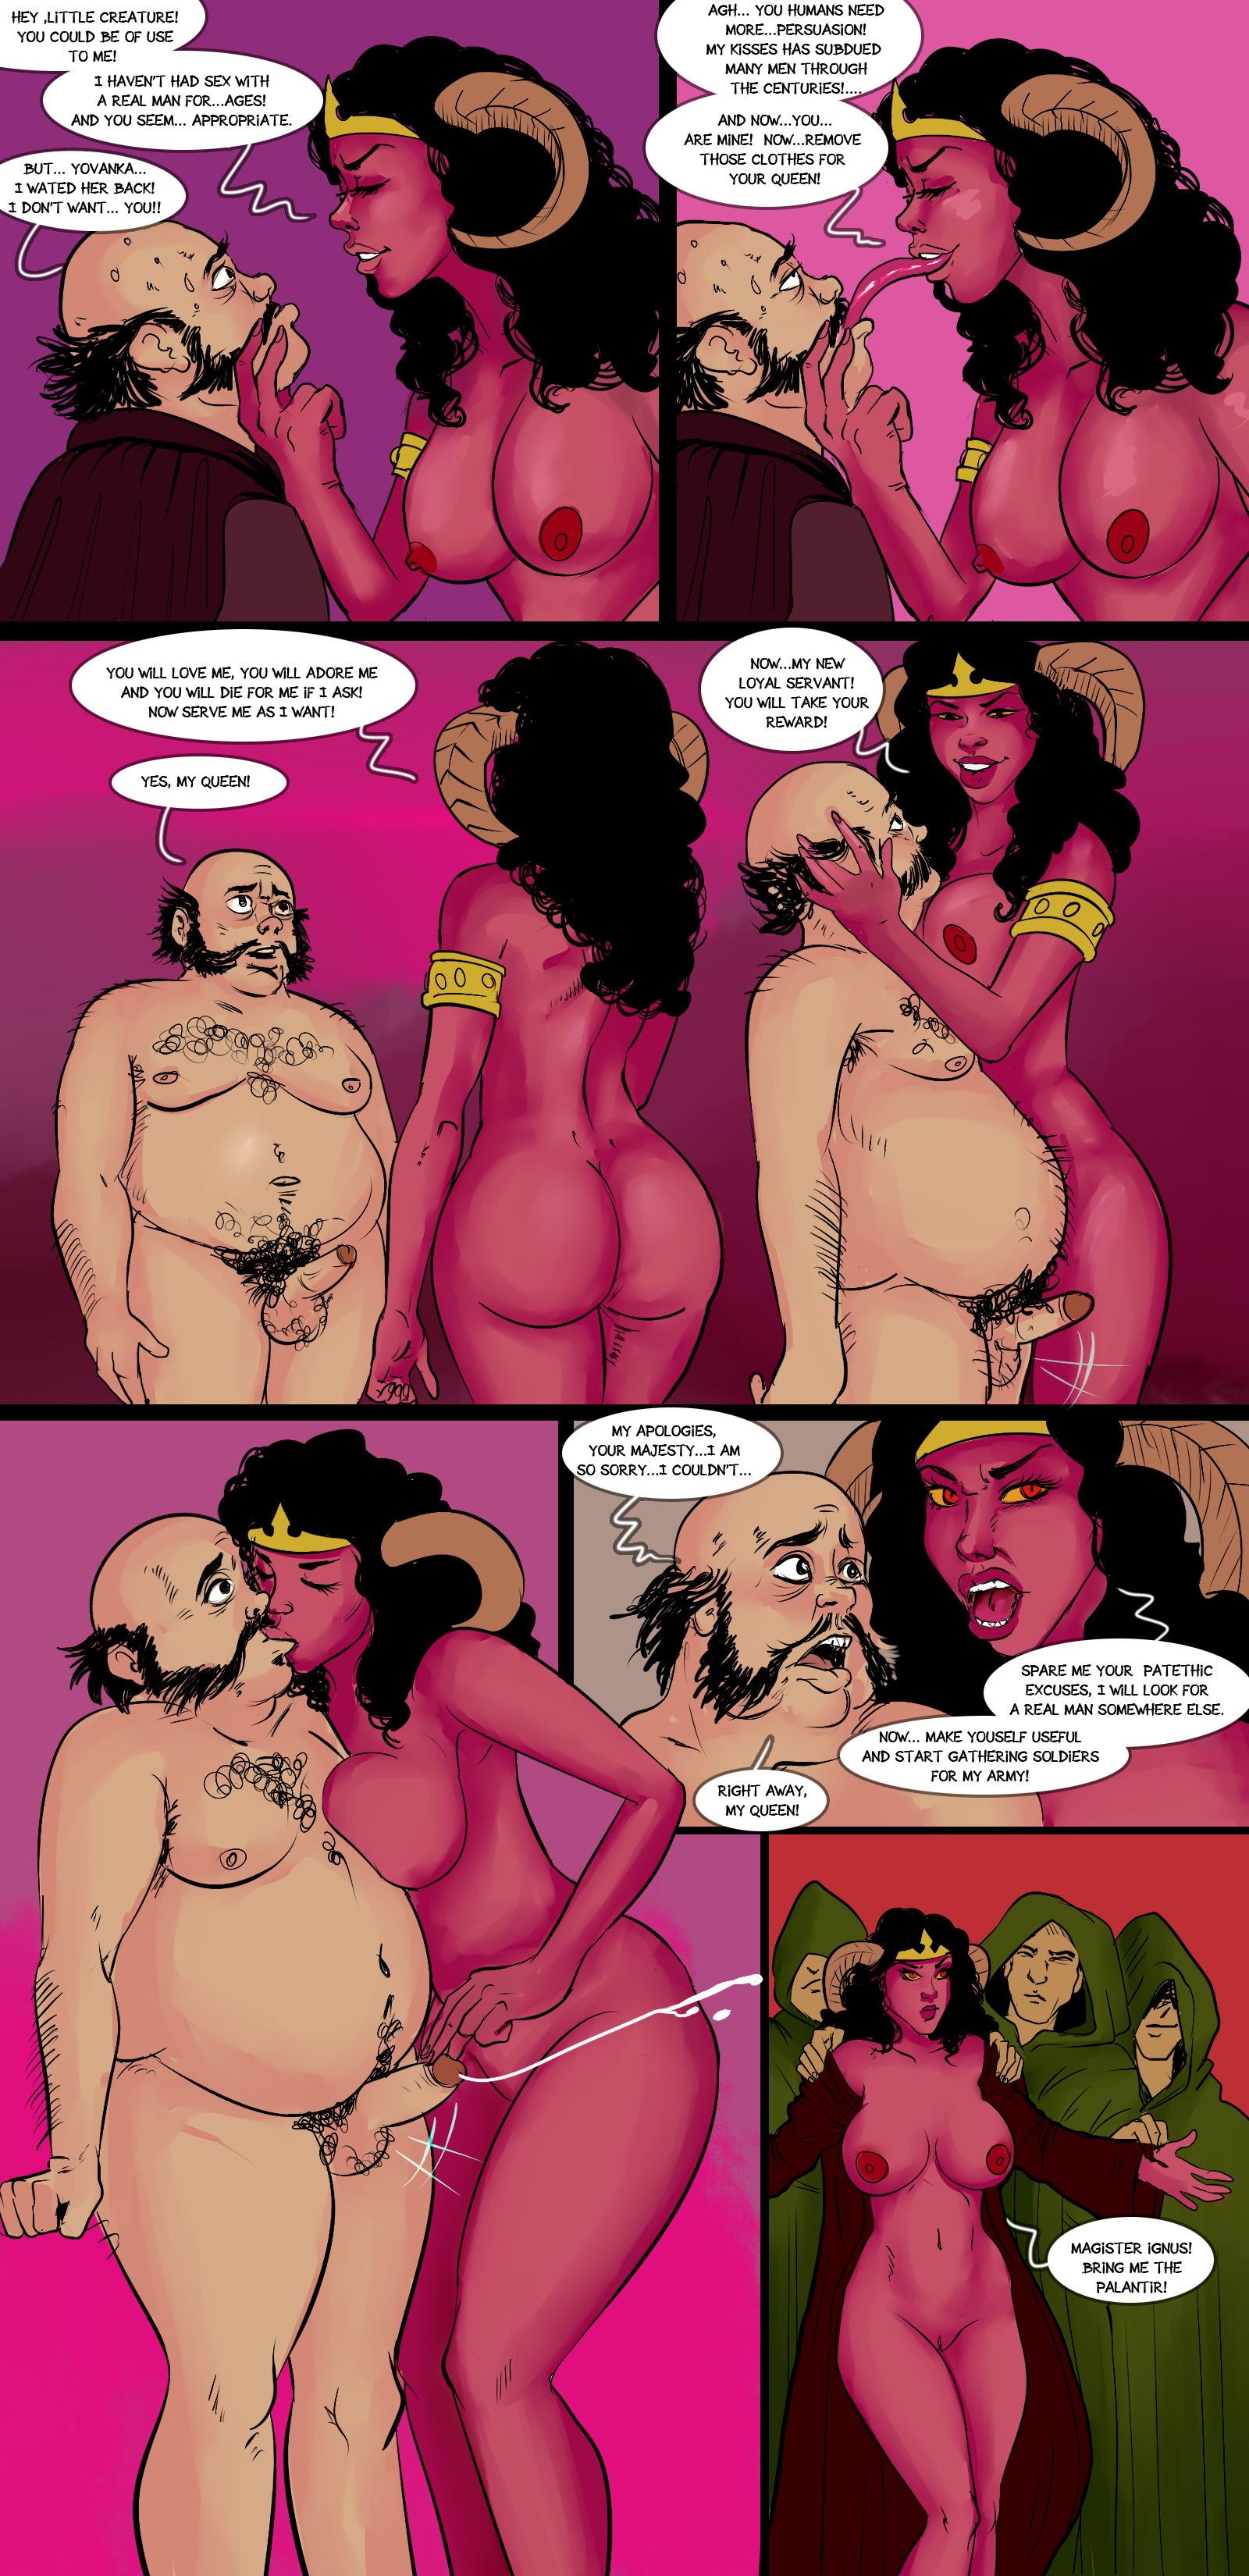 Nicholas The Bard - page 15